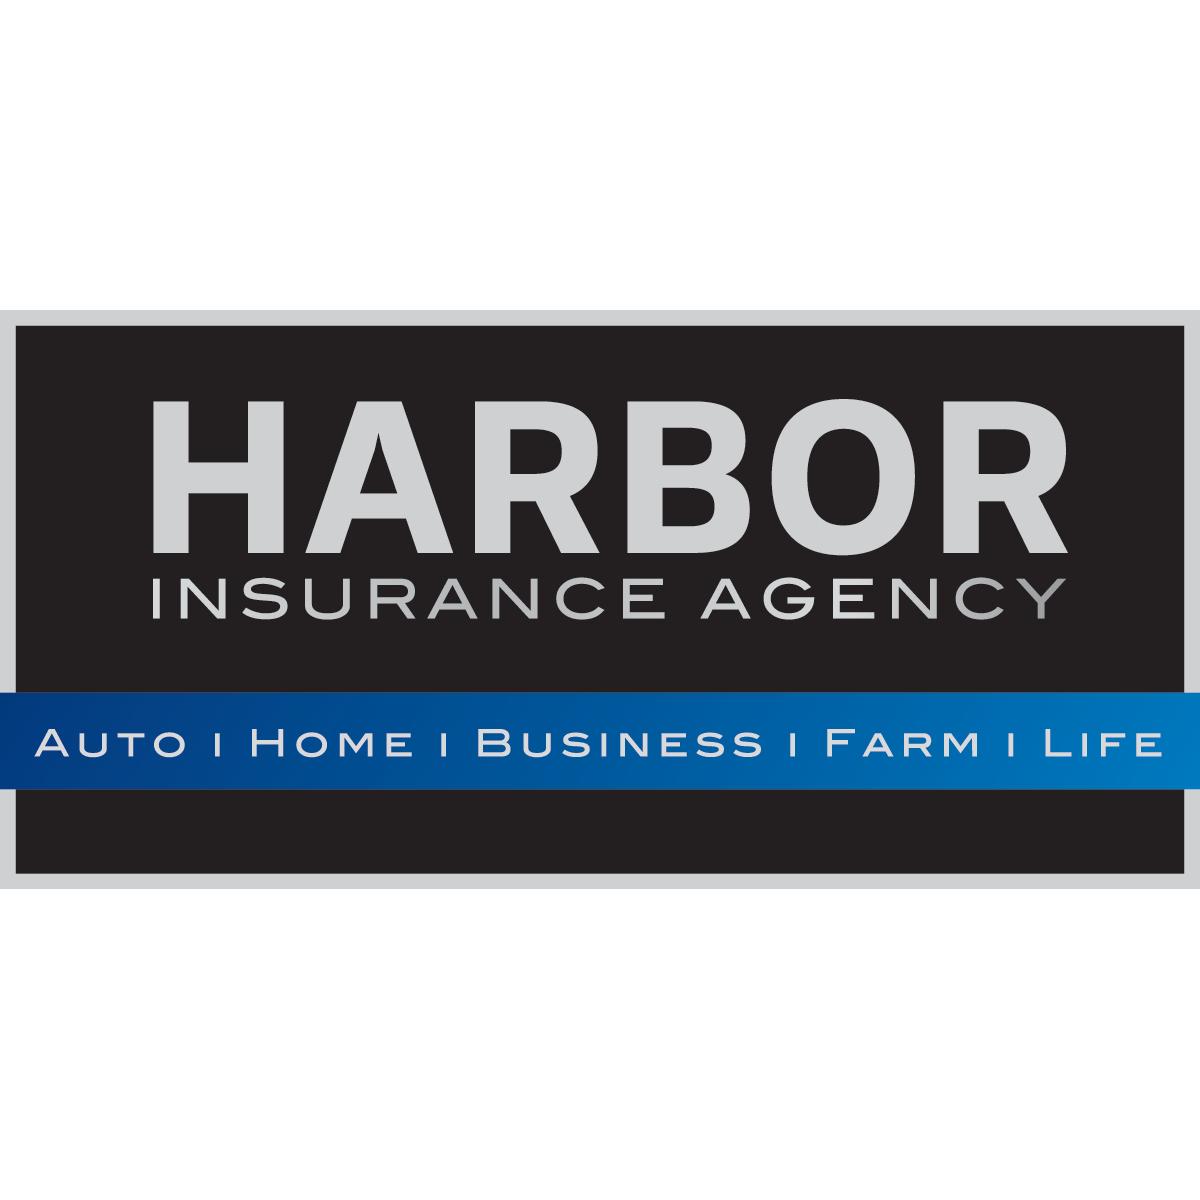 Harbor Insurance Agency